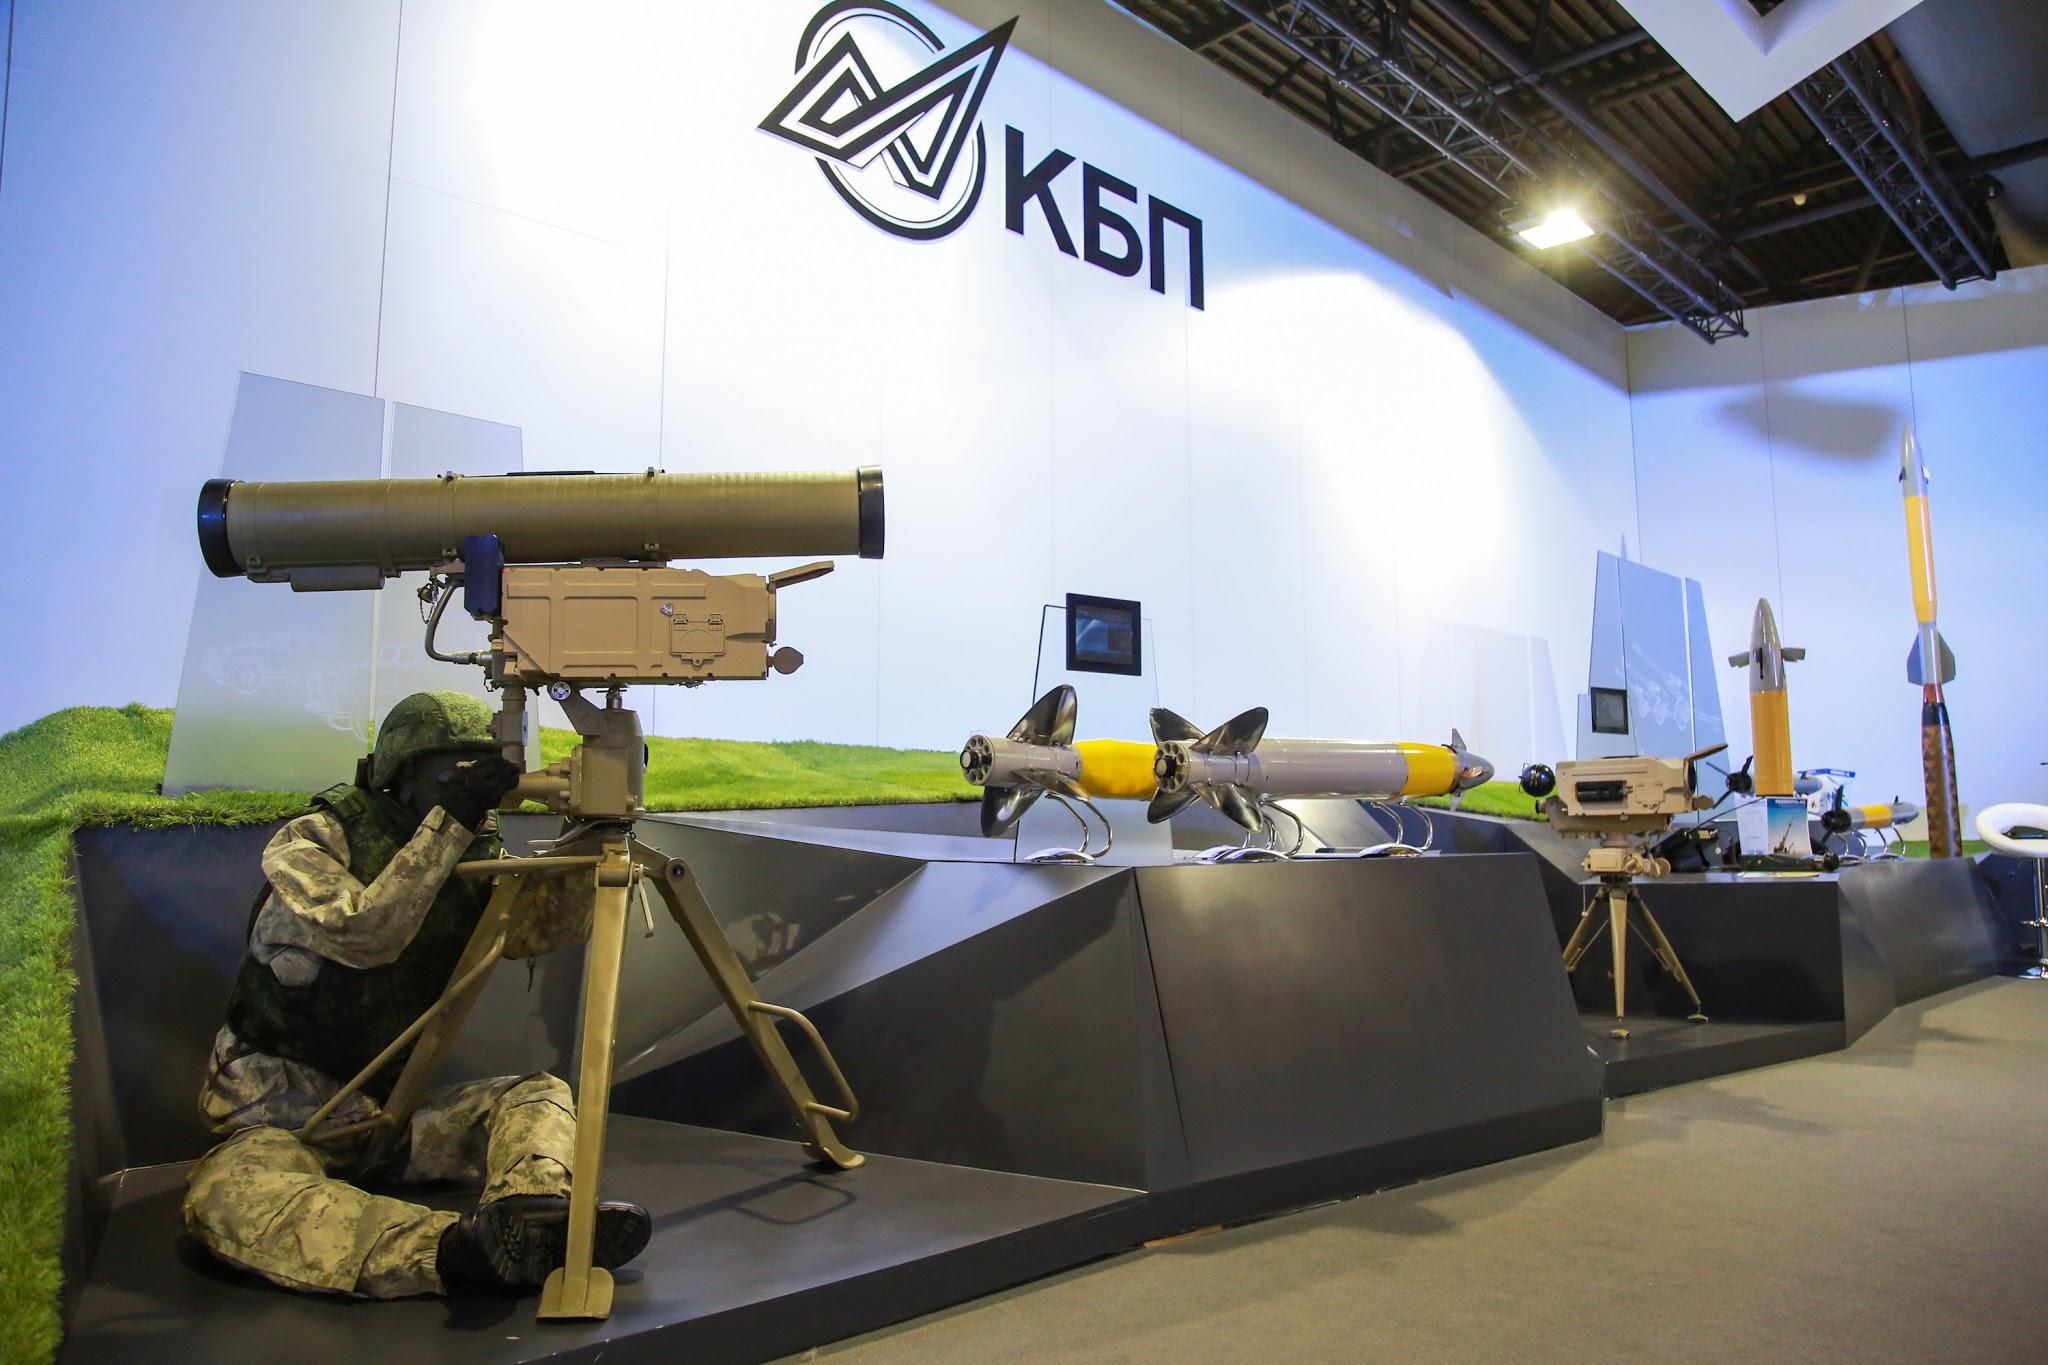 KBP (Konstruktorskoe Buro Priborostroeniya) Instrument Design Bureau